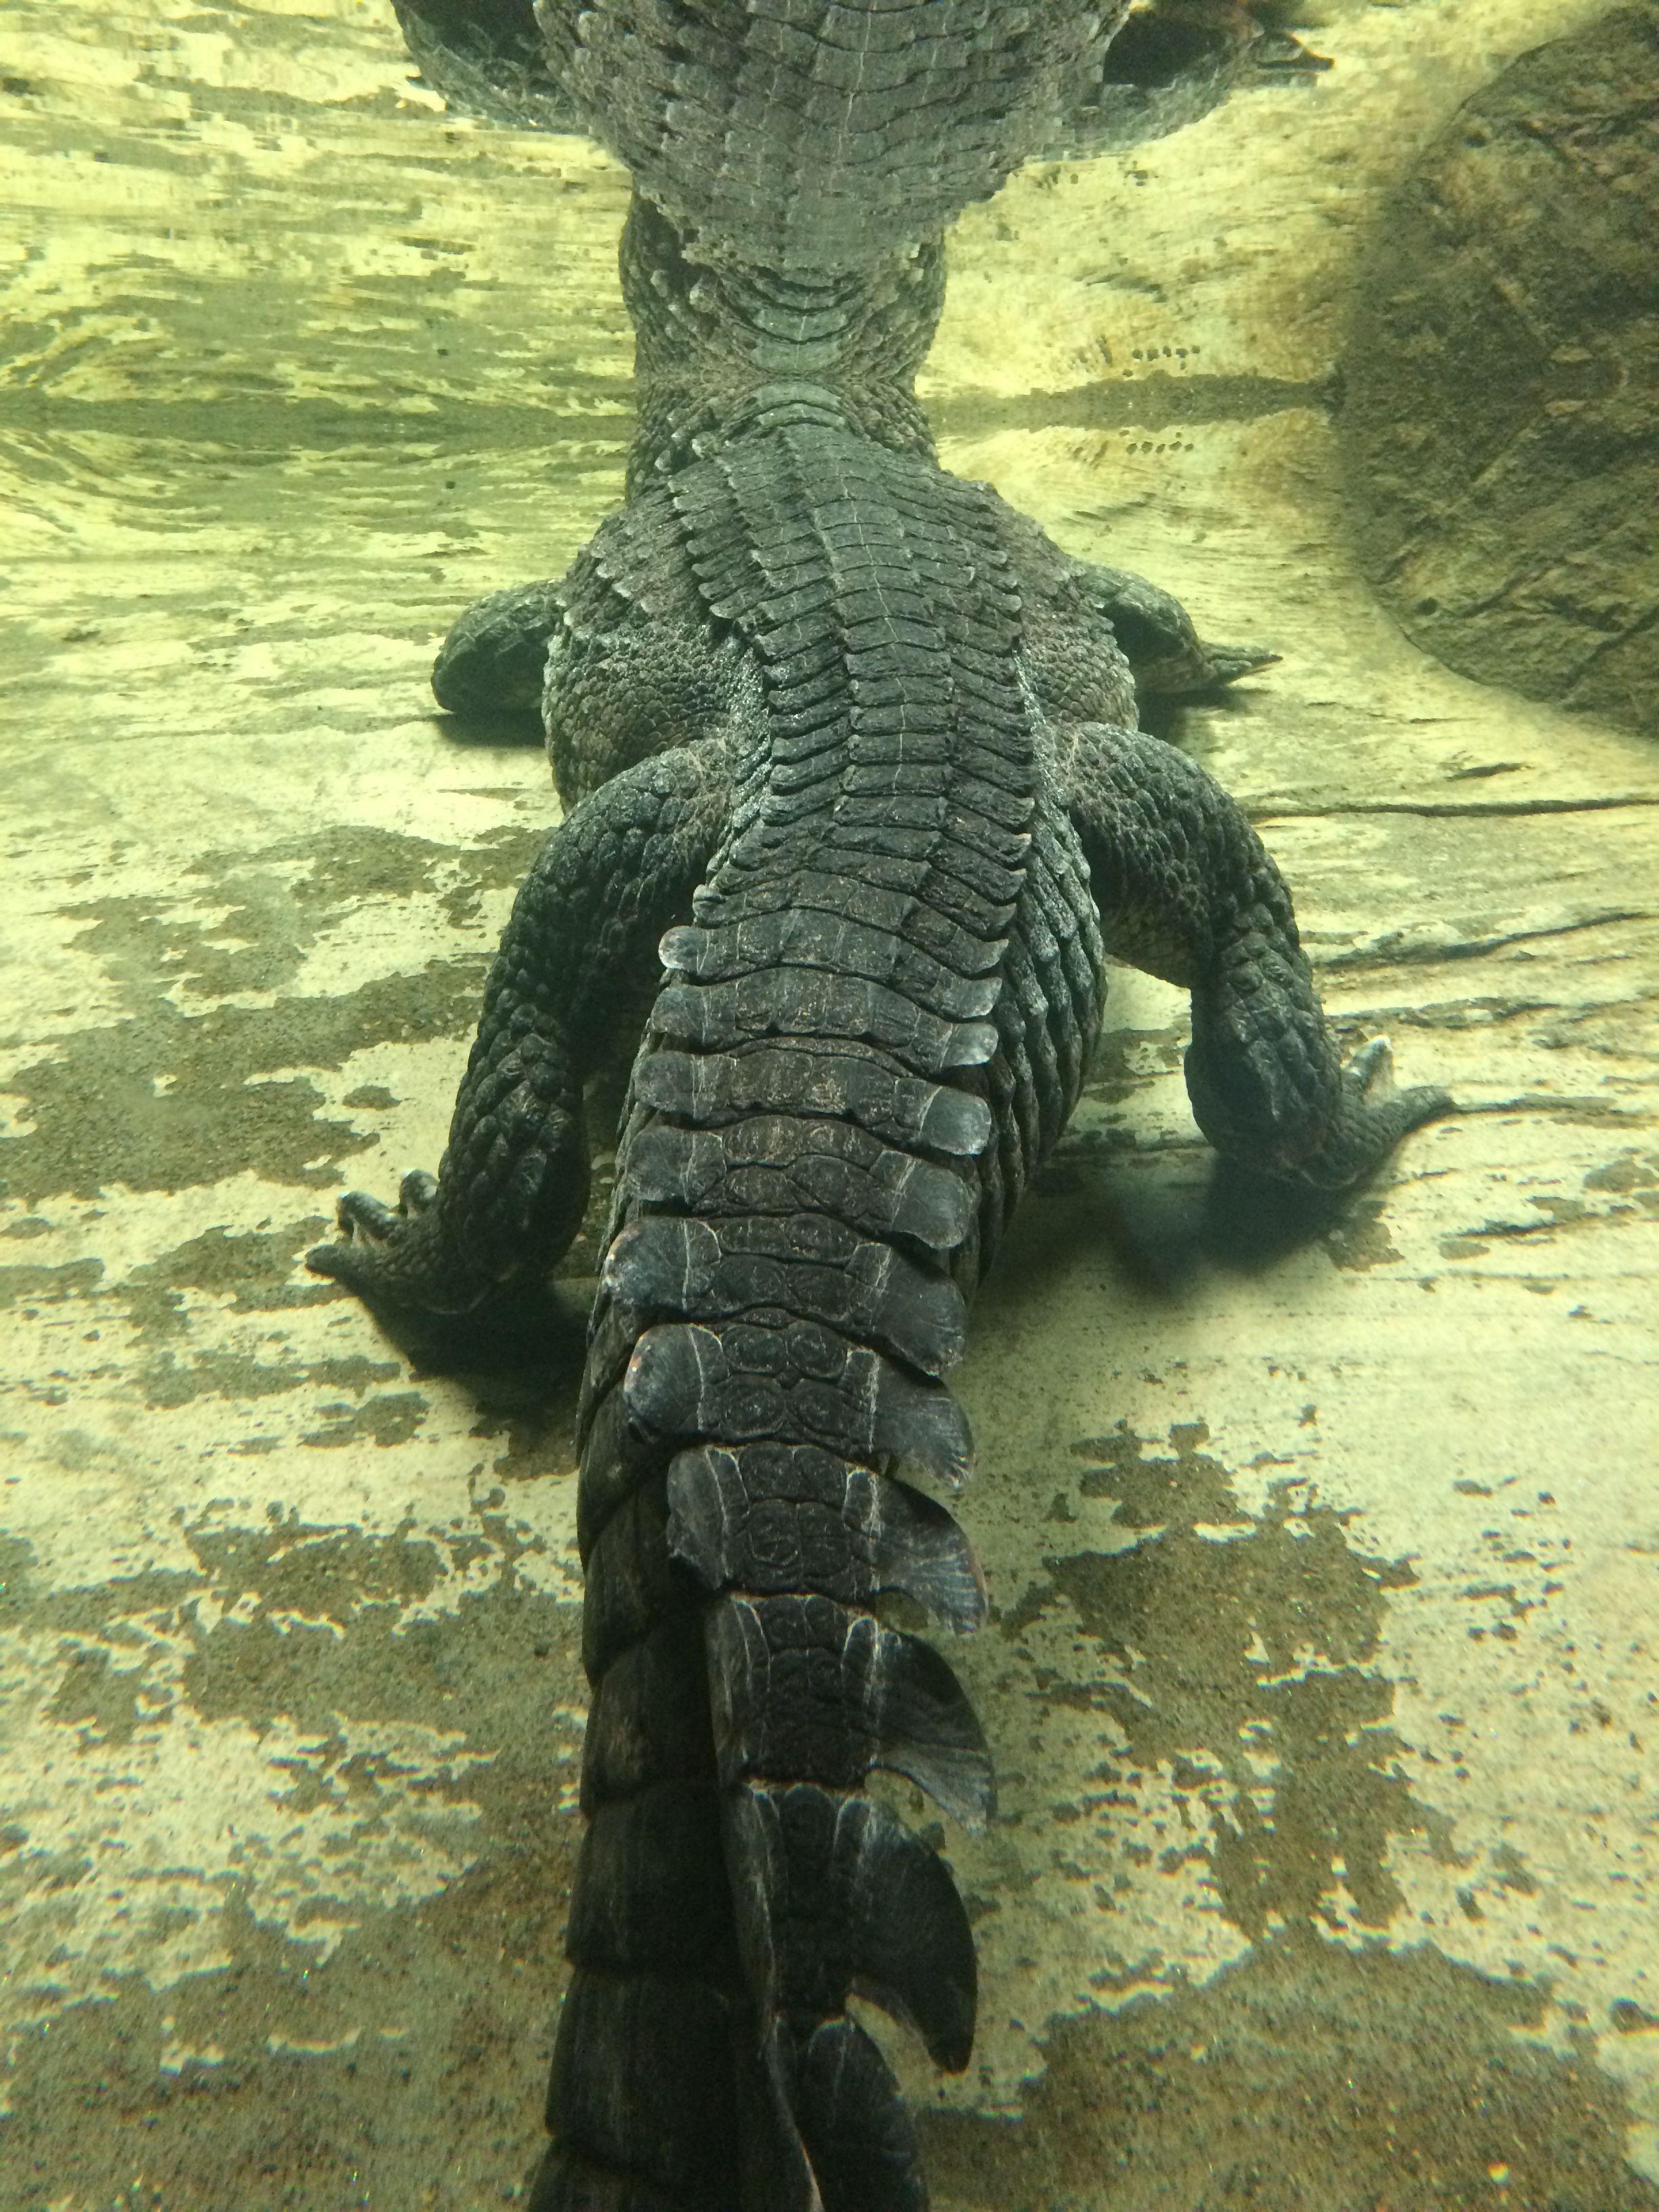 Pin de Derrick LaFramboise en Wildlife | Pinterest | Estudios ...